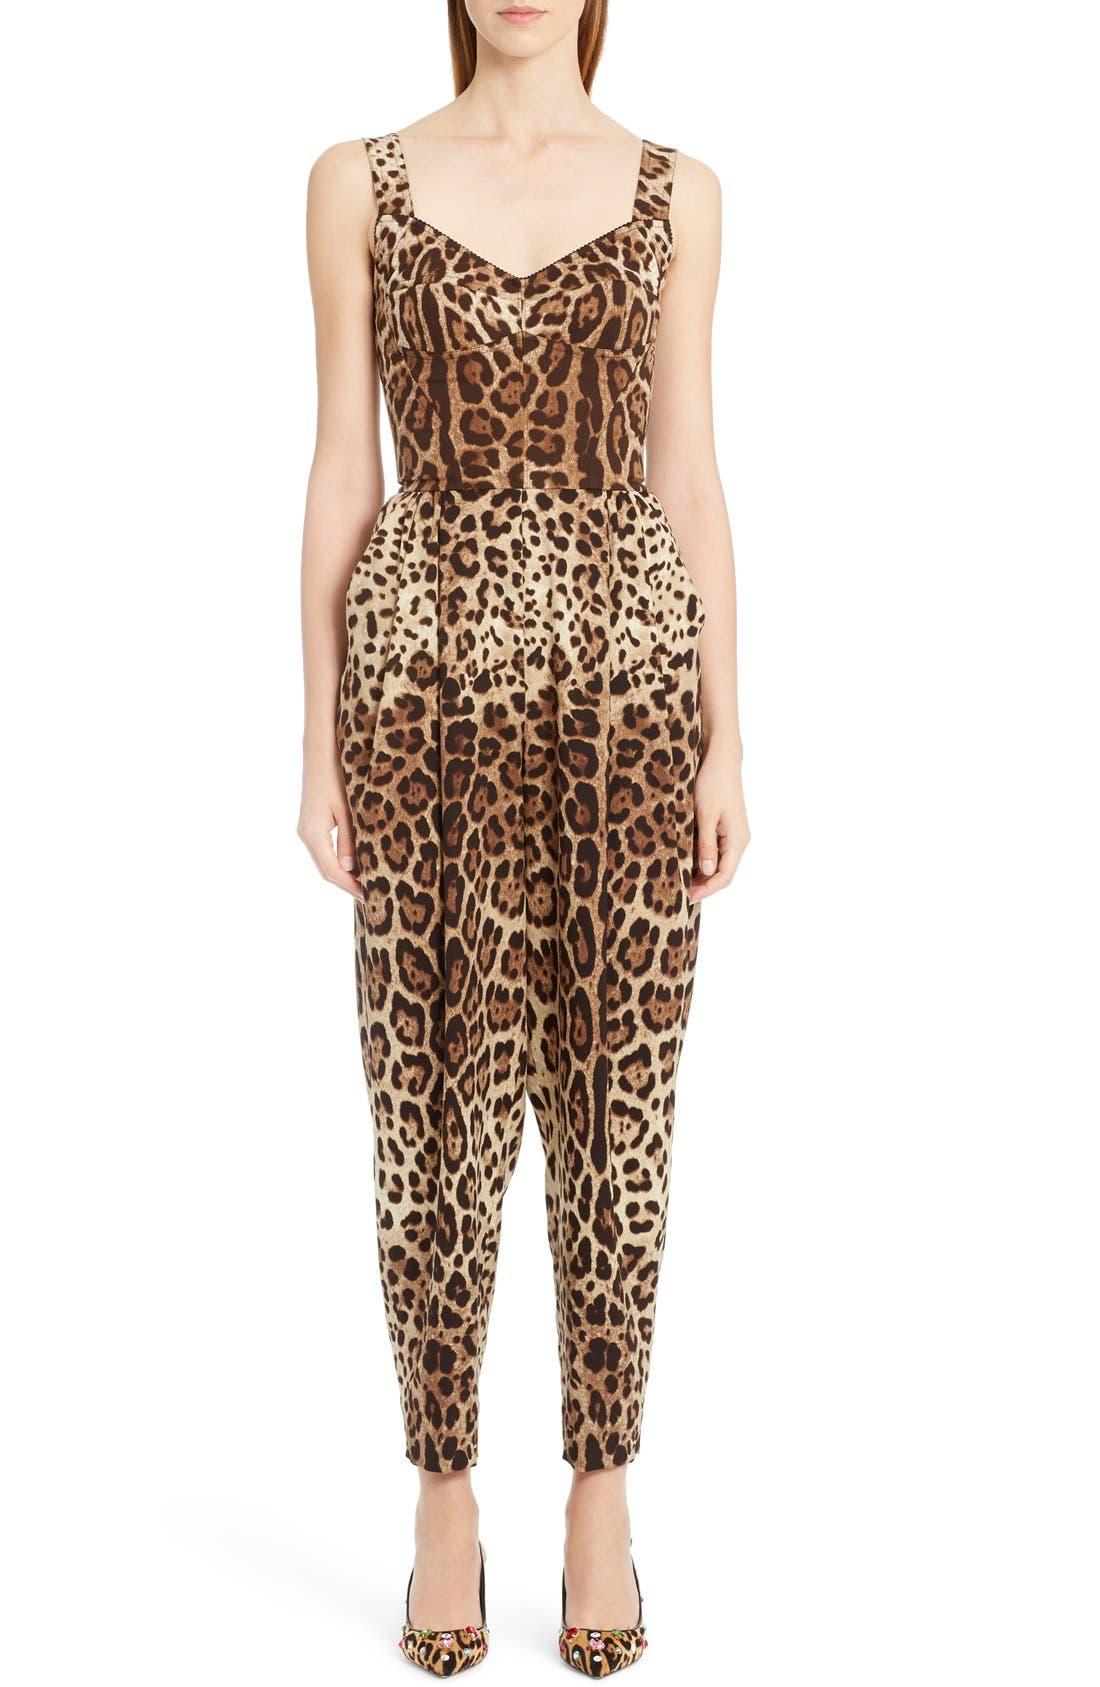 DOLCE&GABBANA Leopard Print Stretch Cady Jumpsuit